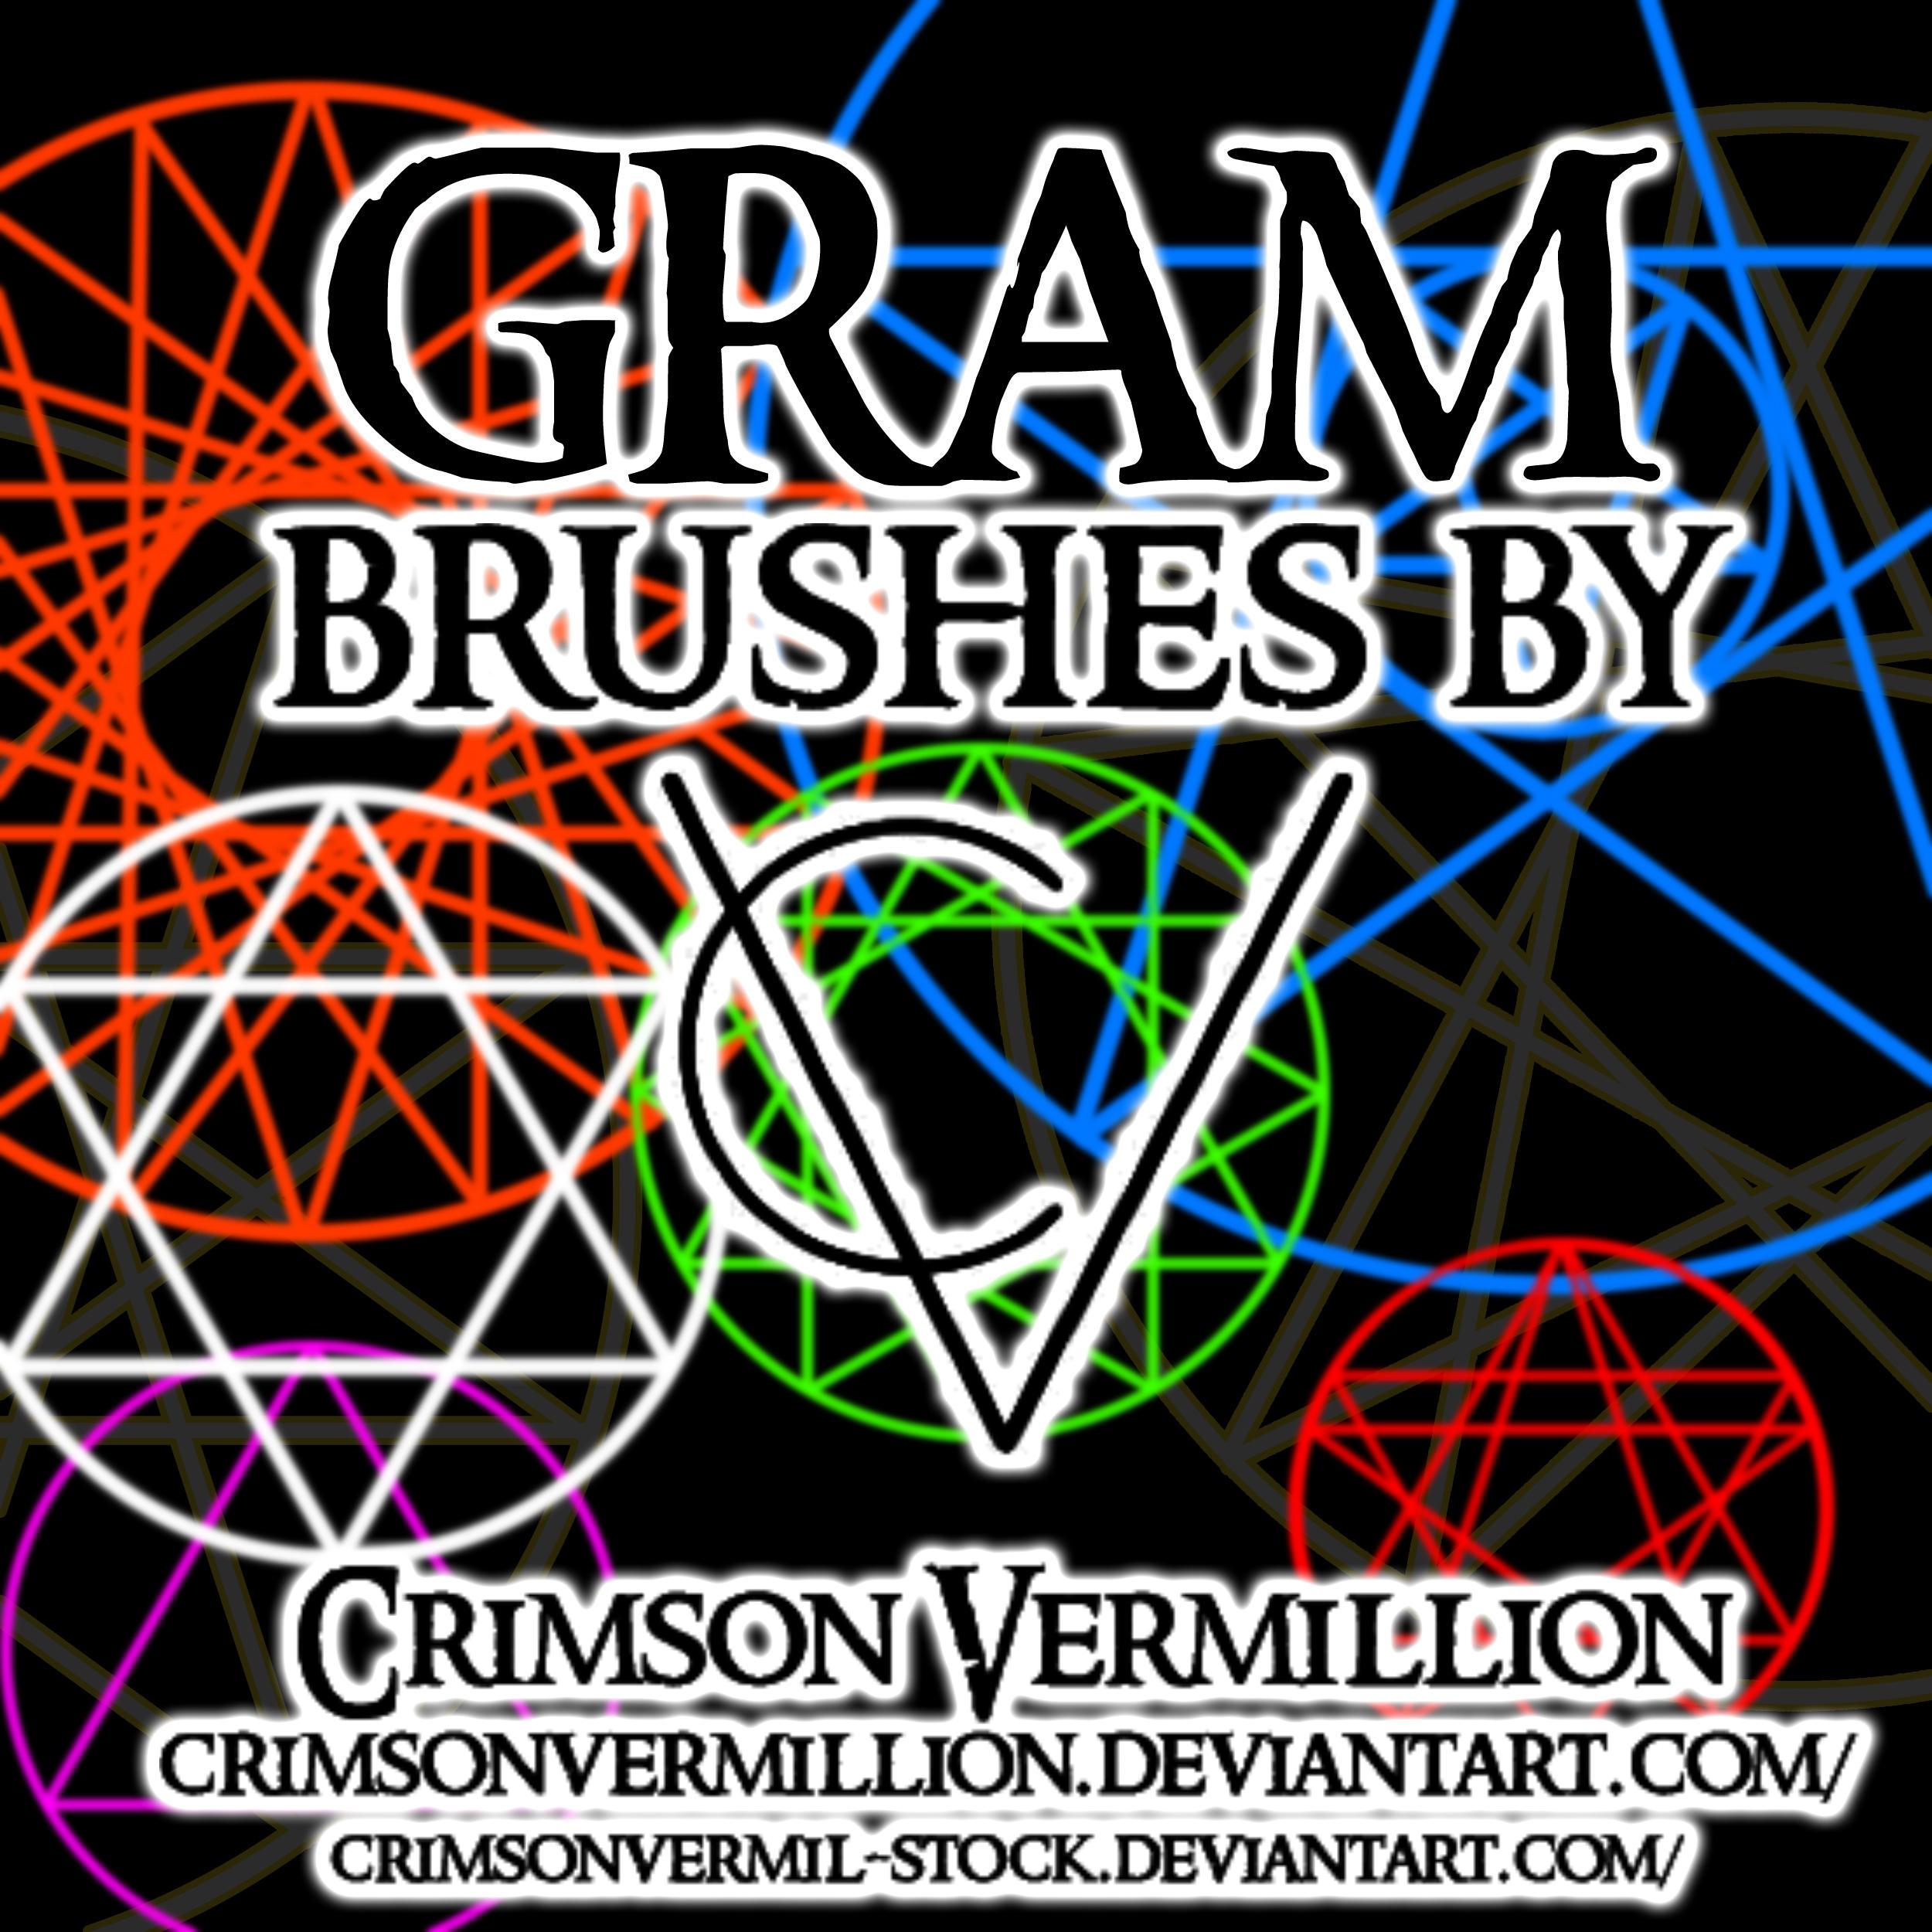 Gram Brushes by crimsonvermil-stock